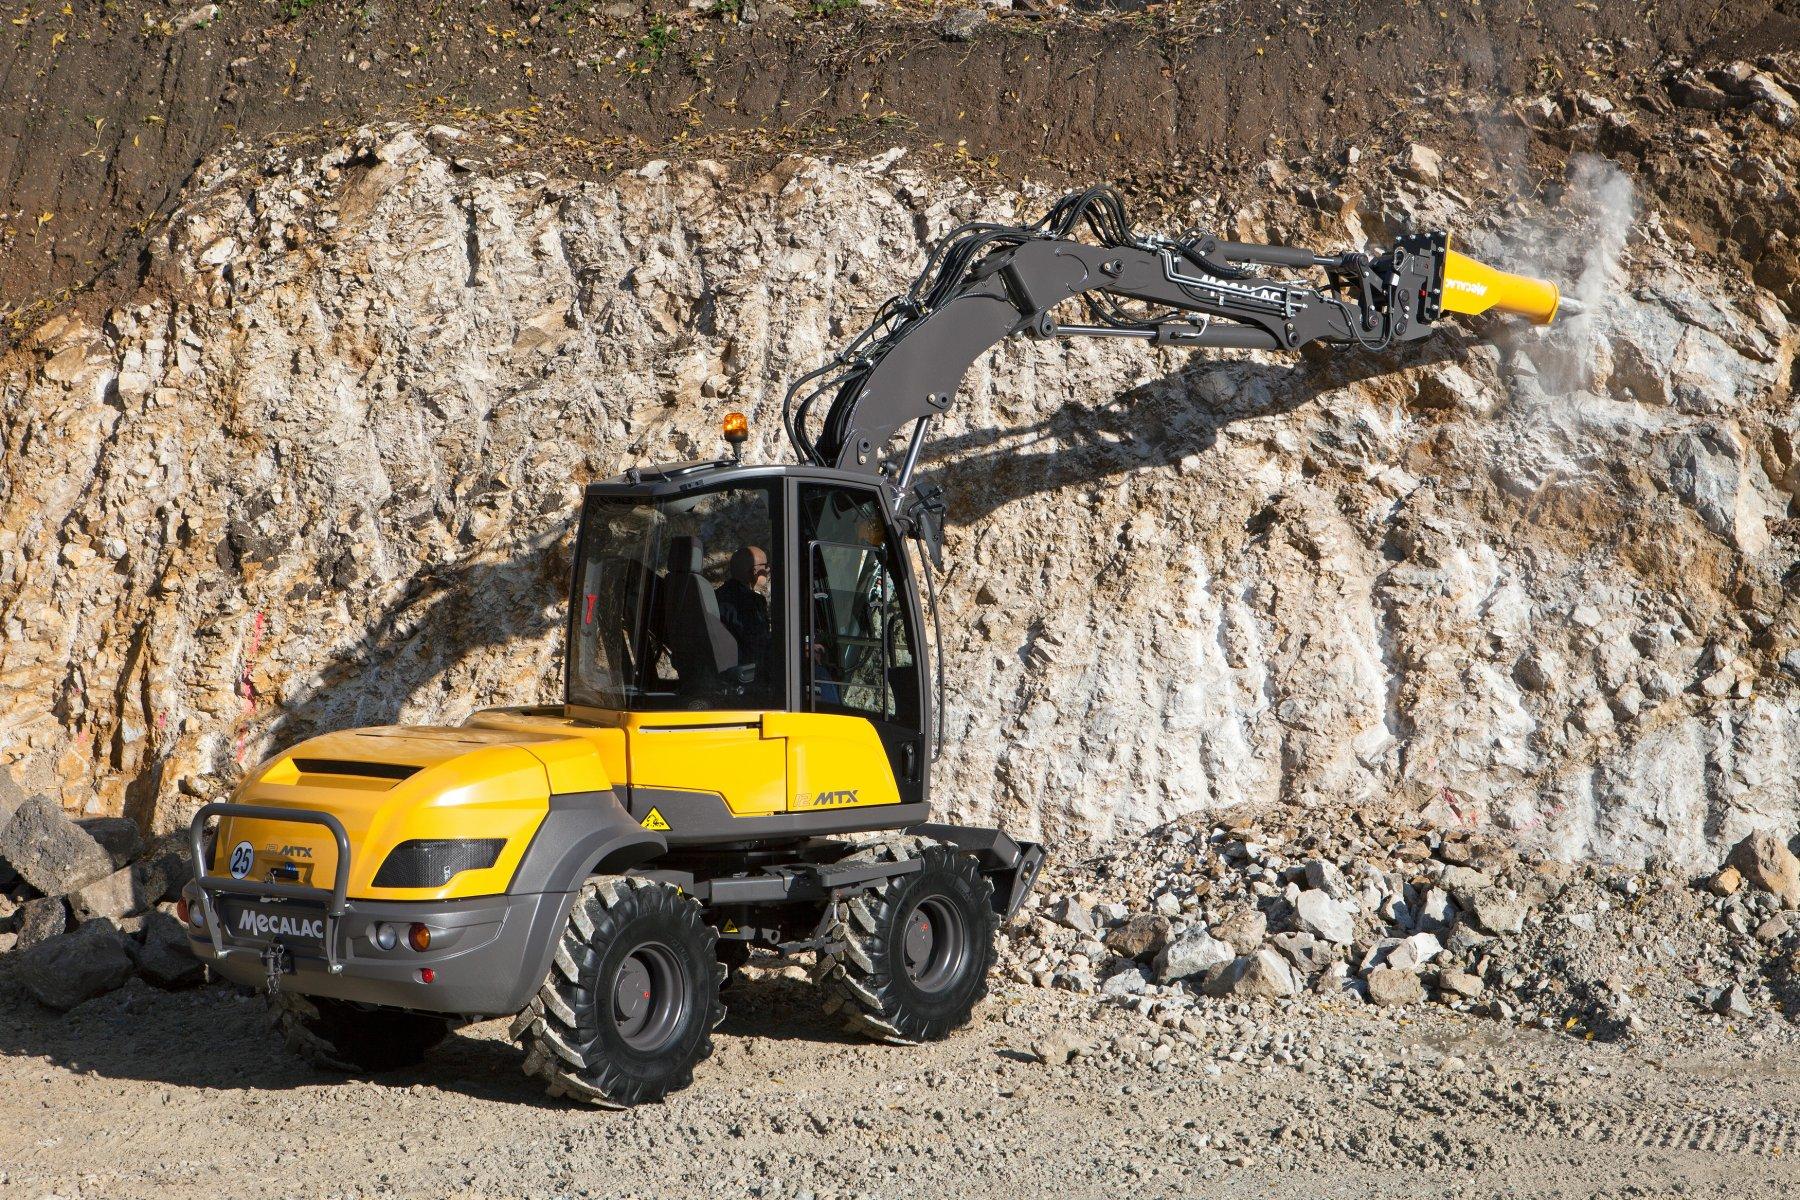 1420532576 mecalac excavator nouvelle12mtx 39